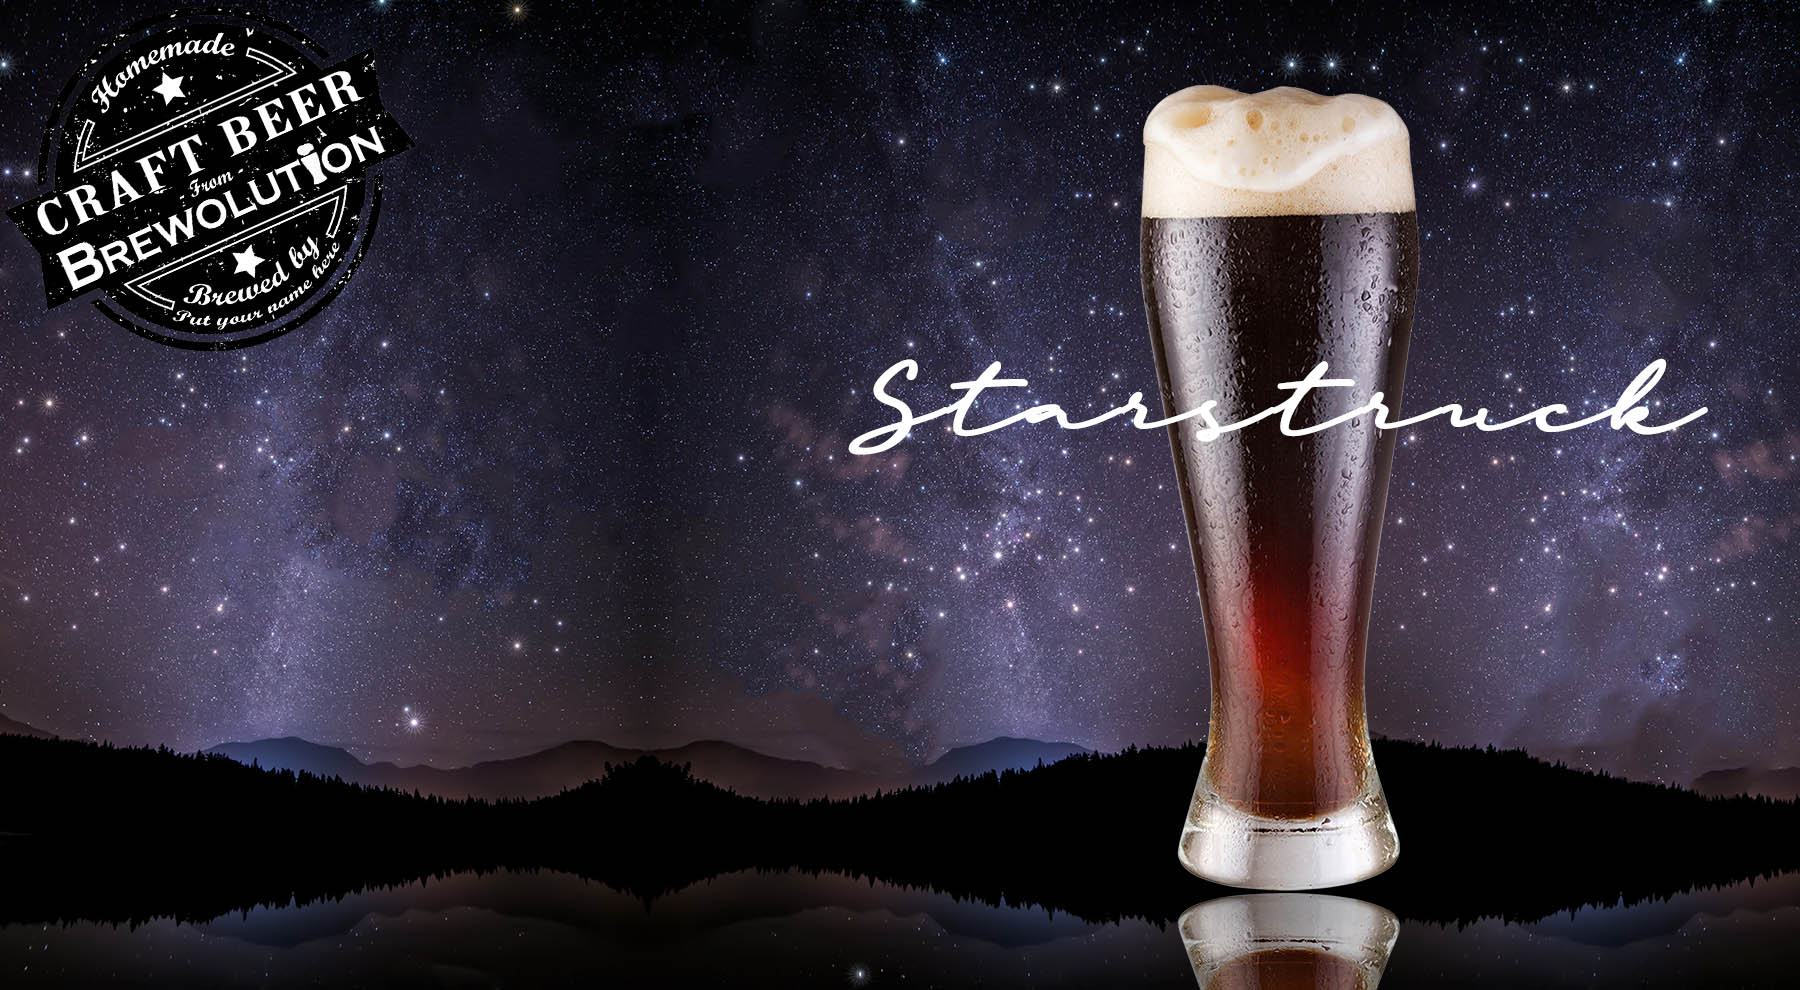 Starstruk